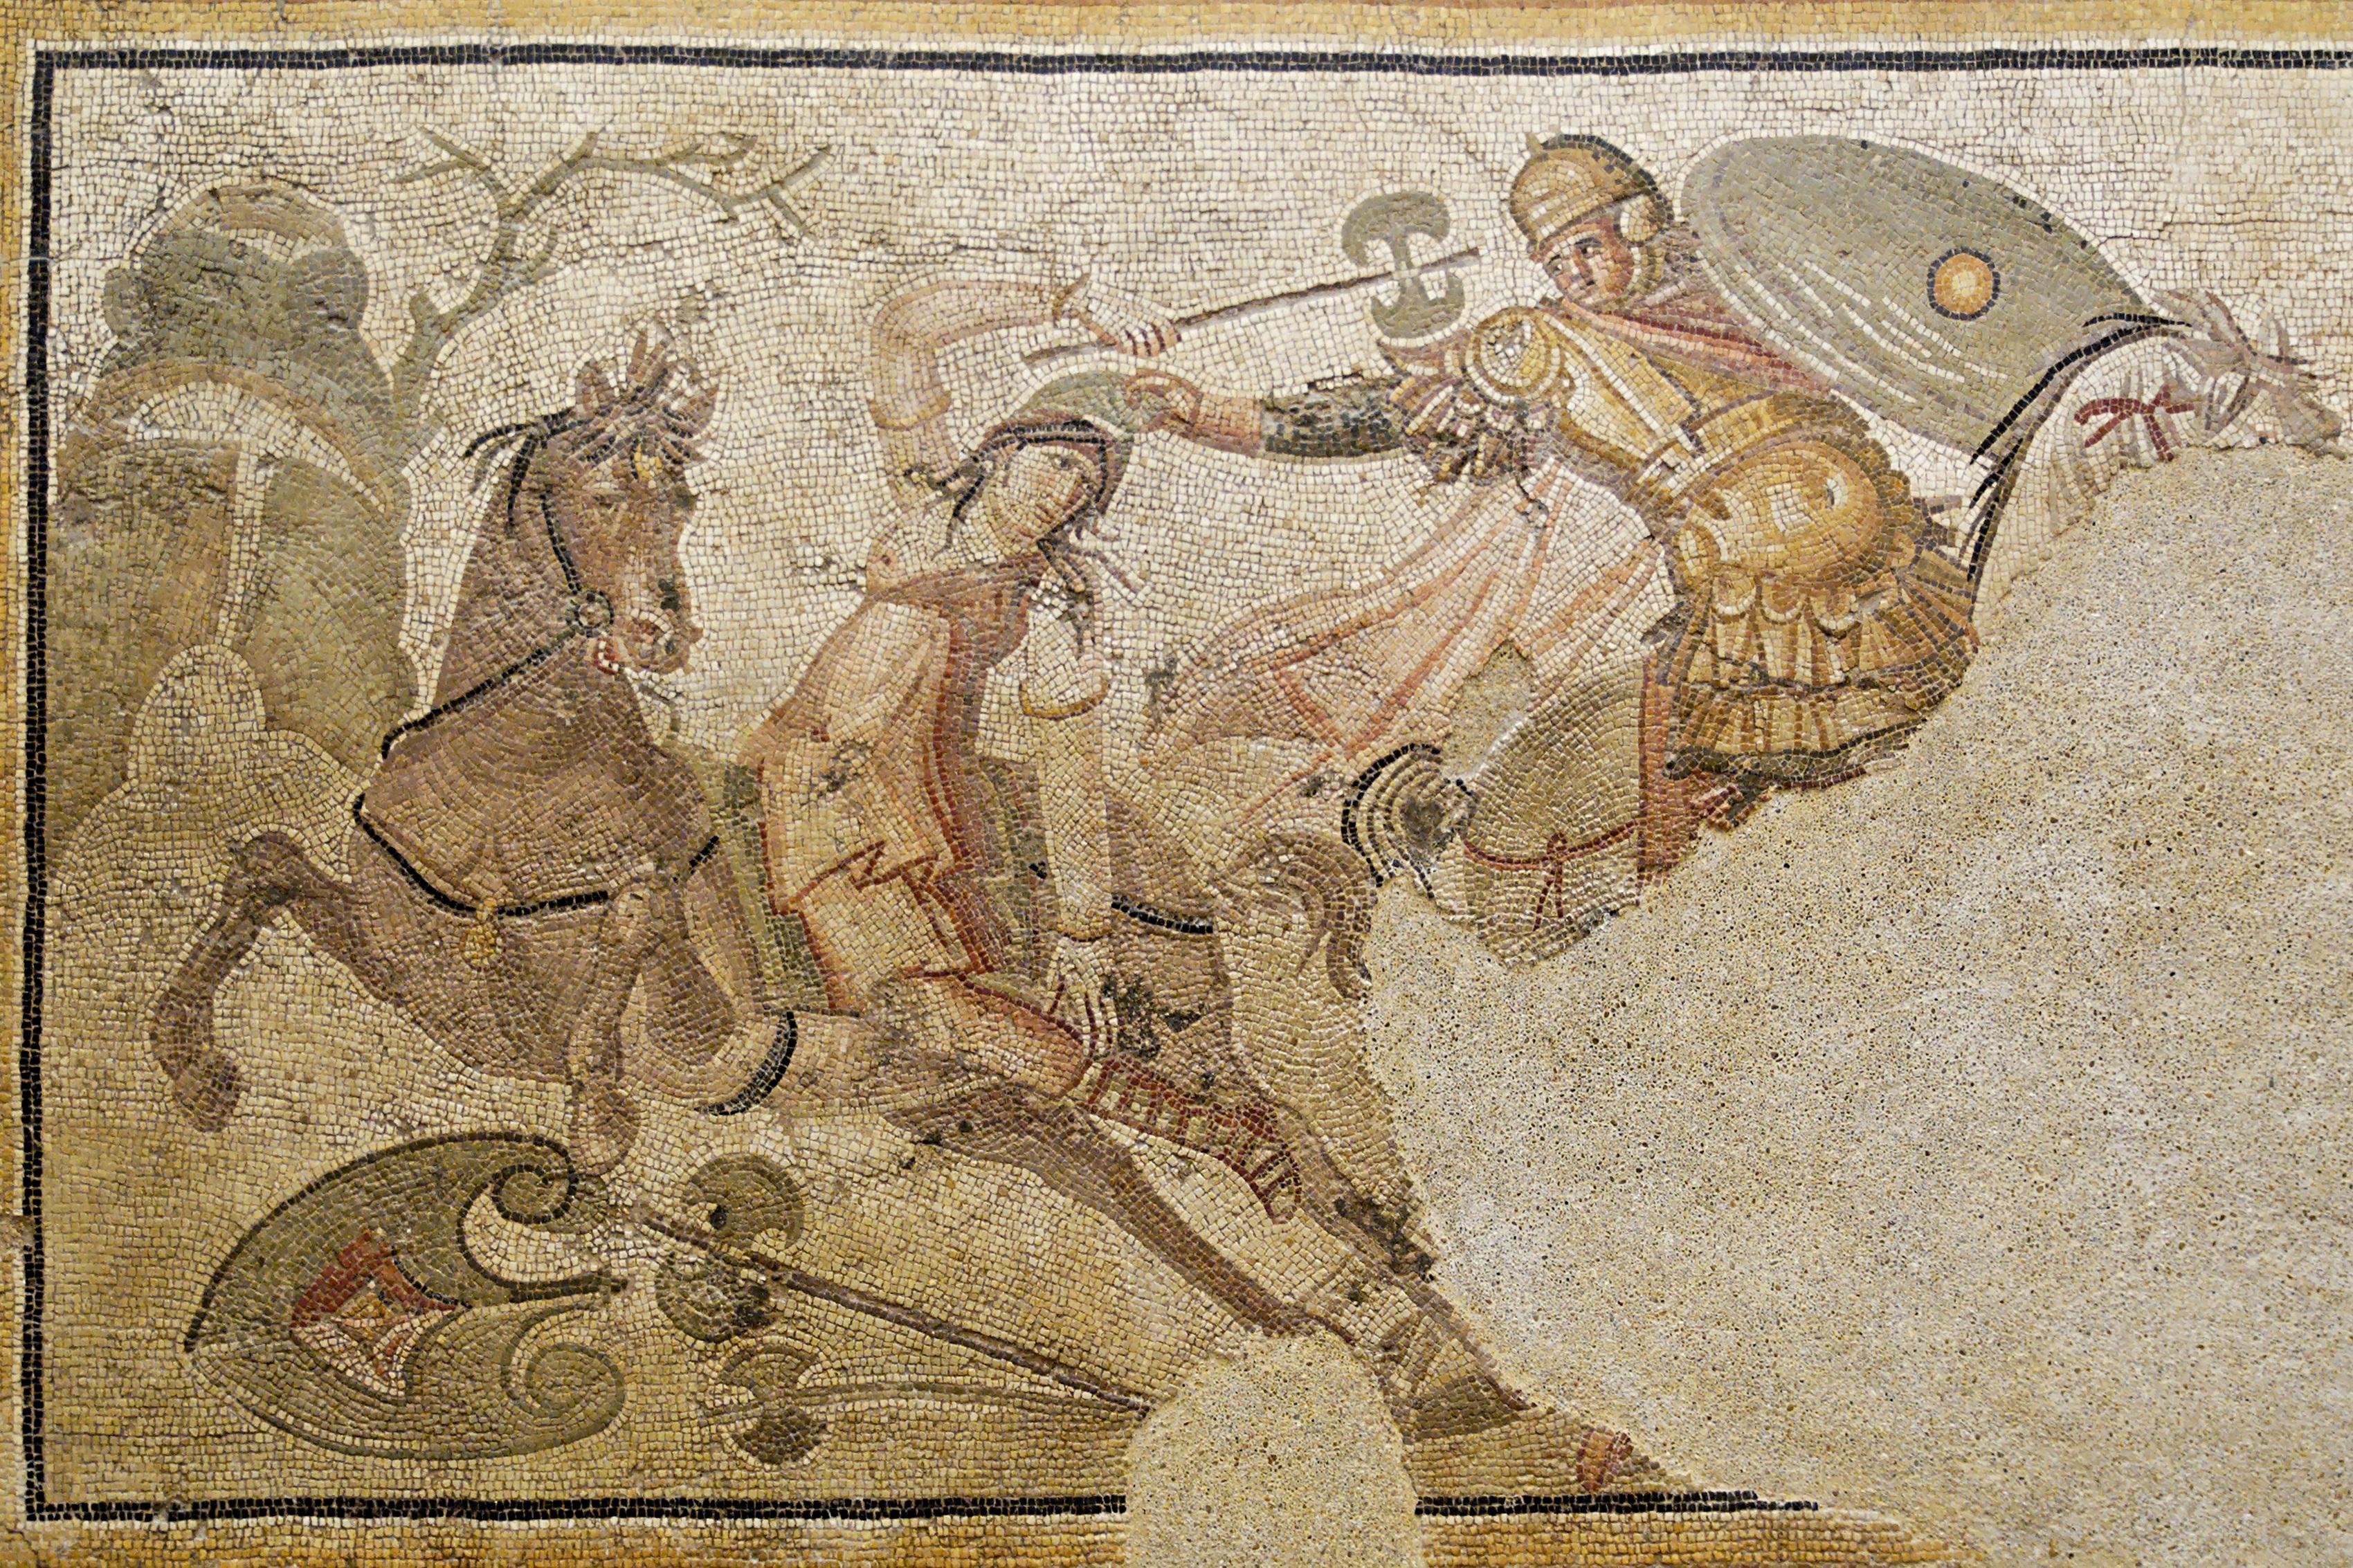 [Image: Amazonomachy_Antioch_Louvre_Ma3457.jpg]